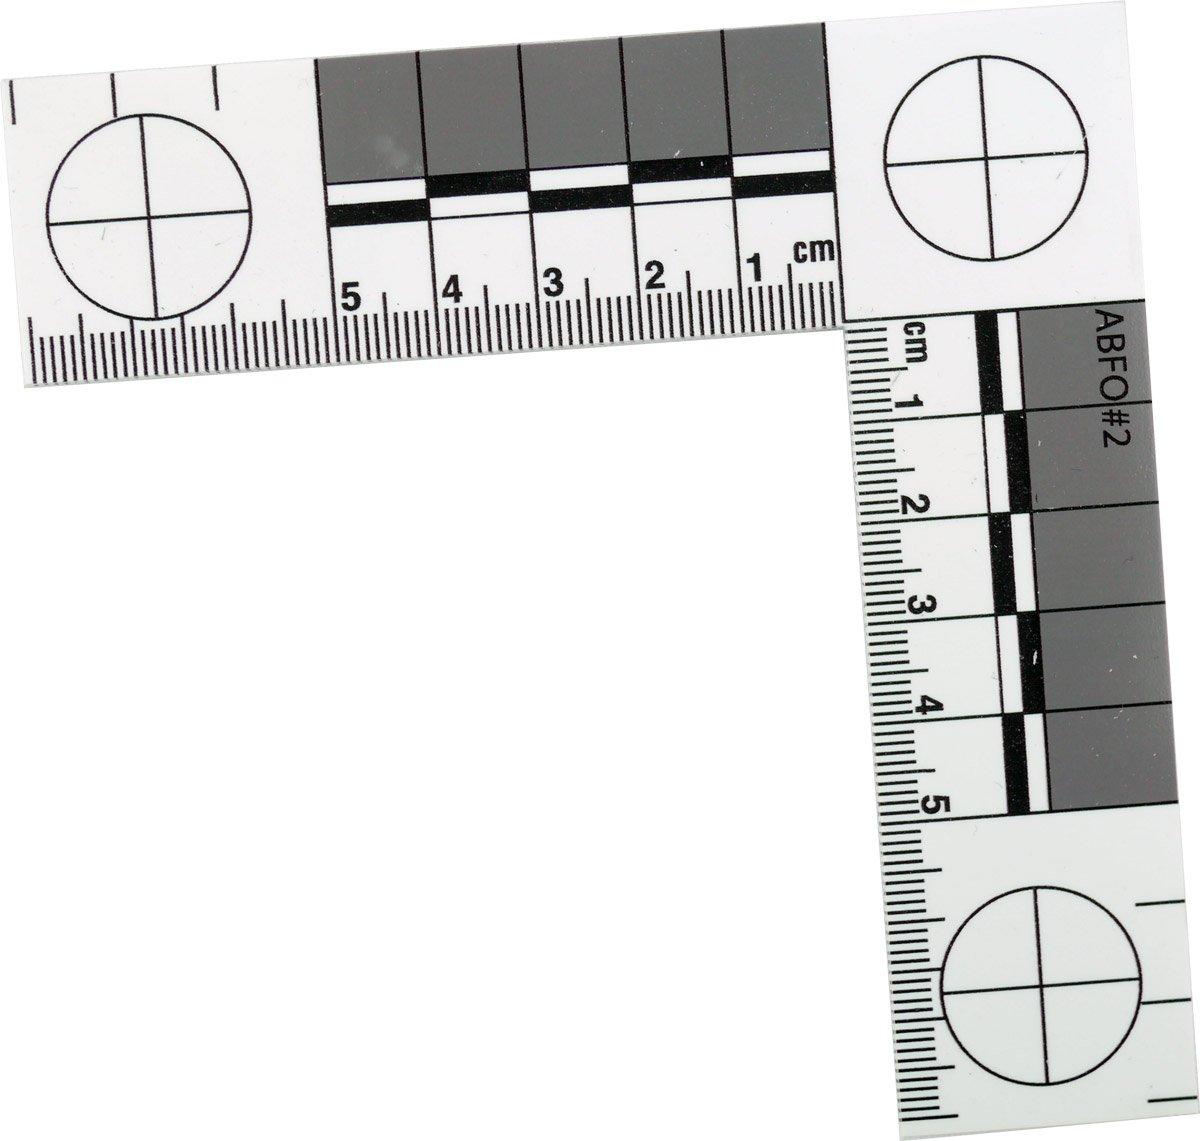 No Cutting Radius 10mm Shank Diameter 32mm Maximum Bore Depth Solid Carbide Tool BBM-100932 Micro 100 Metric Dimensions 72mm Overall Length 9mm Minimum Bore Diameter 2.25mm Projection Right Hand Boring Tool